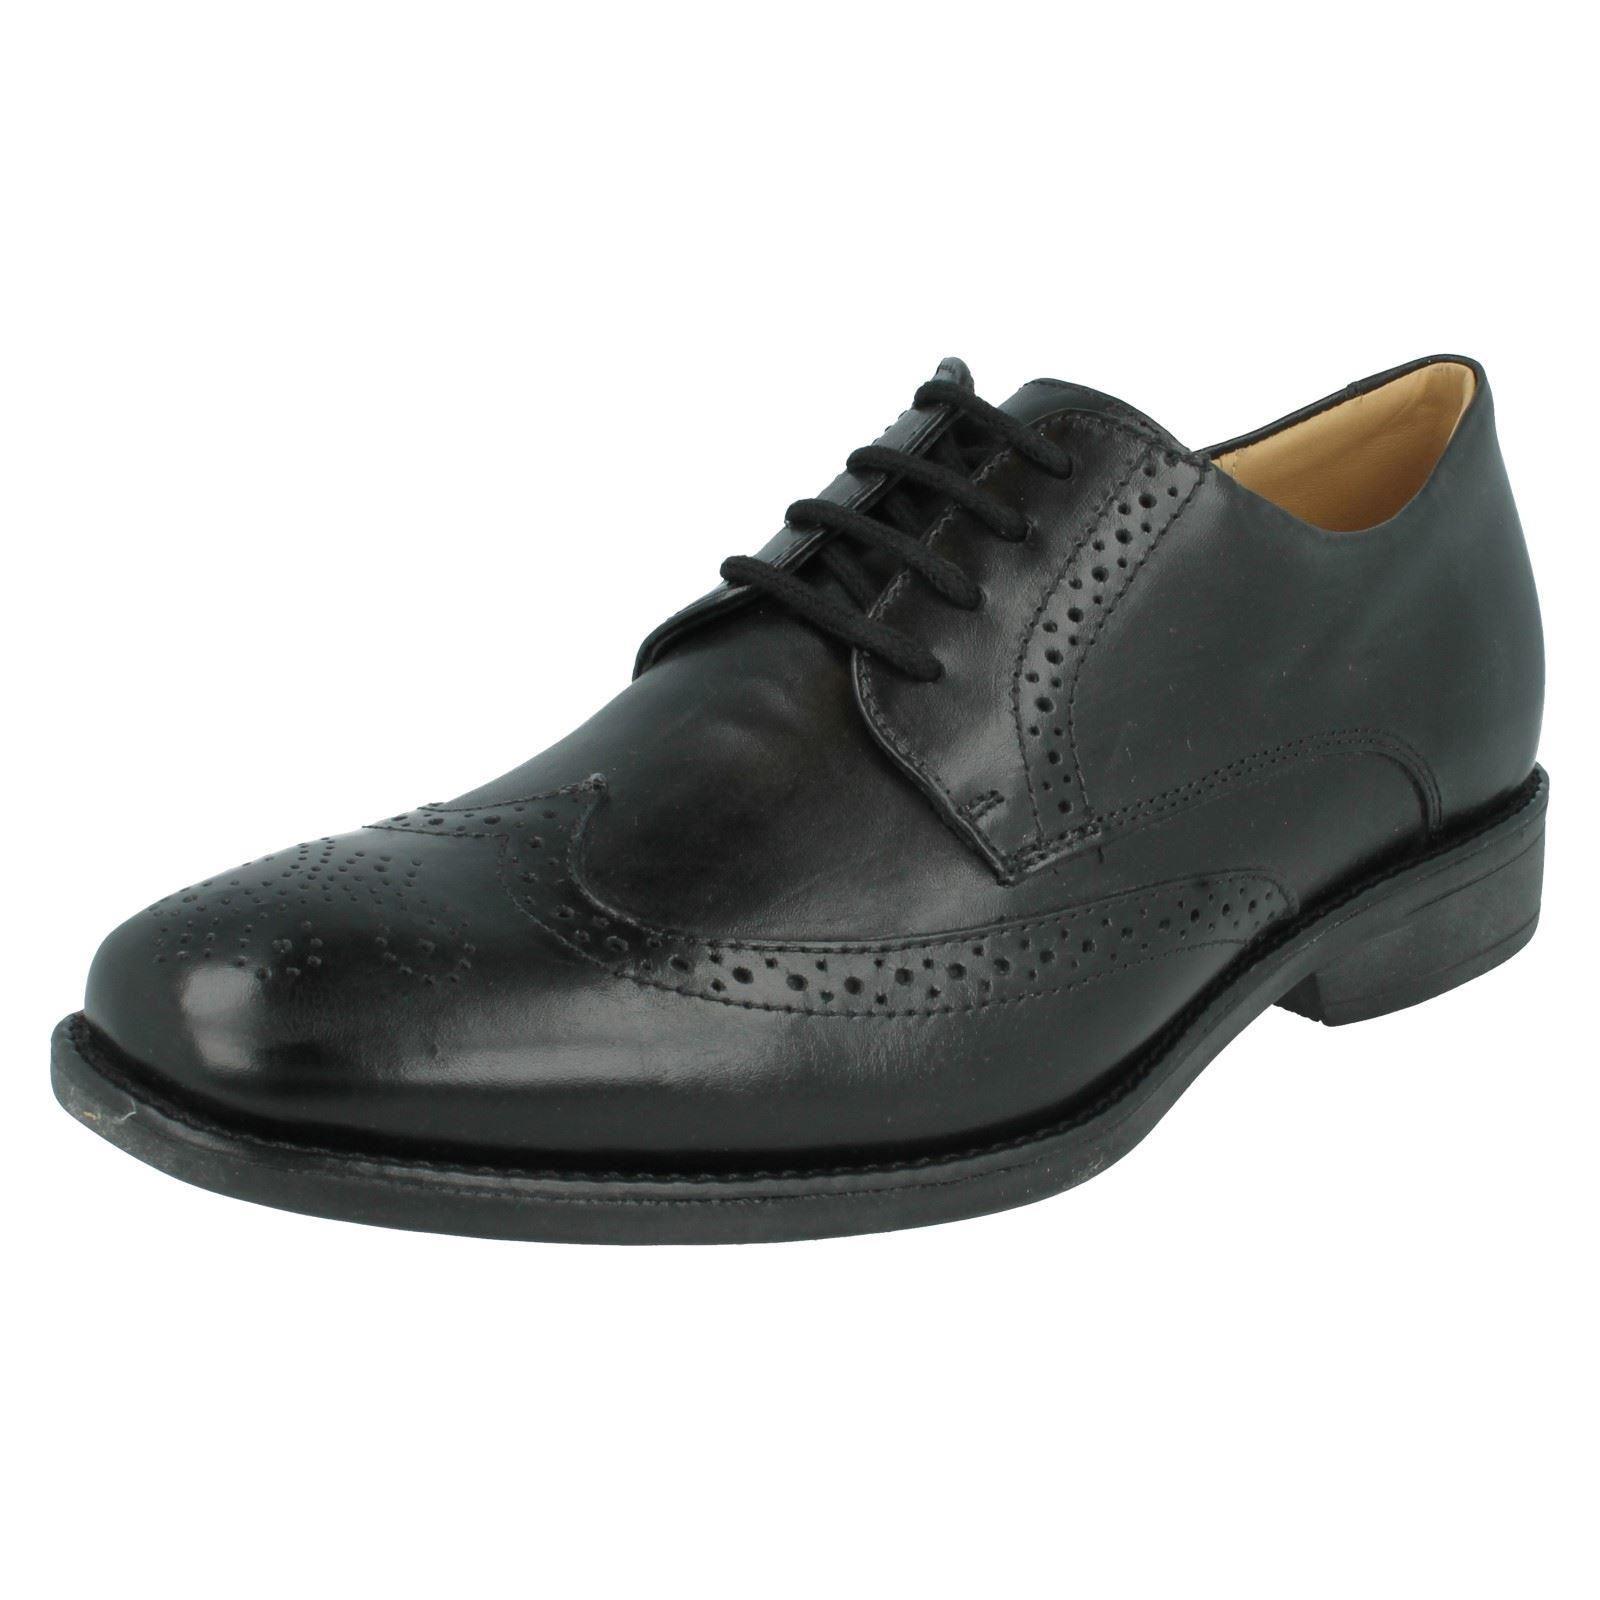 Mens Anatomic & Co 'Mococa' Leather Shoes Label ' K Q4YhF8h